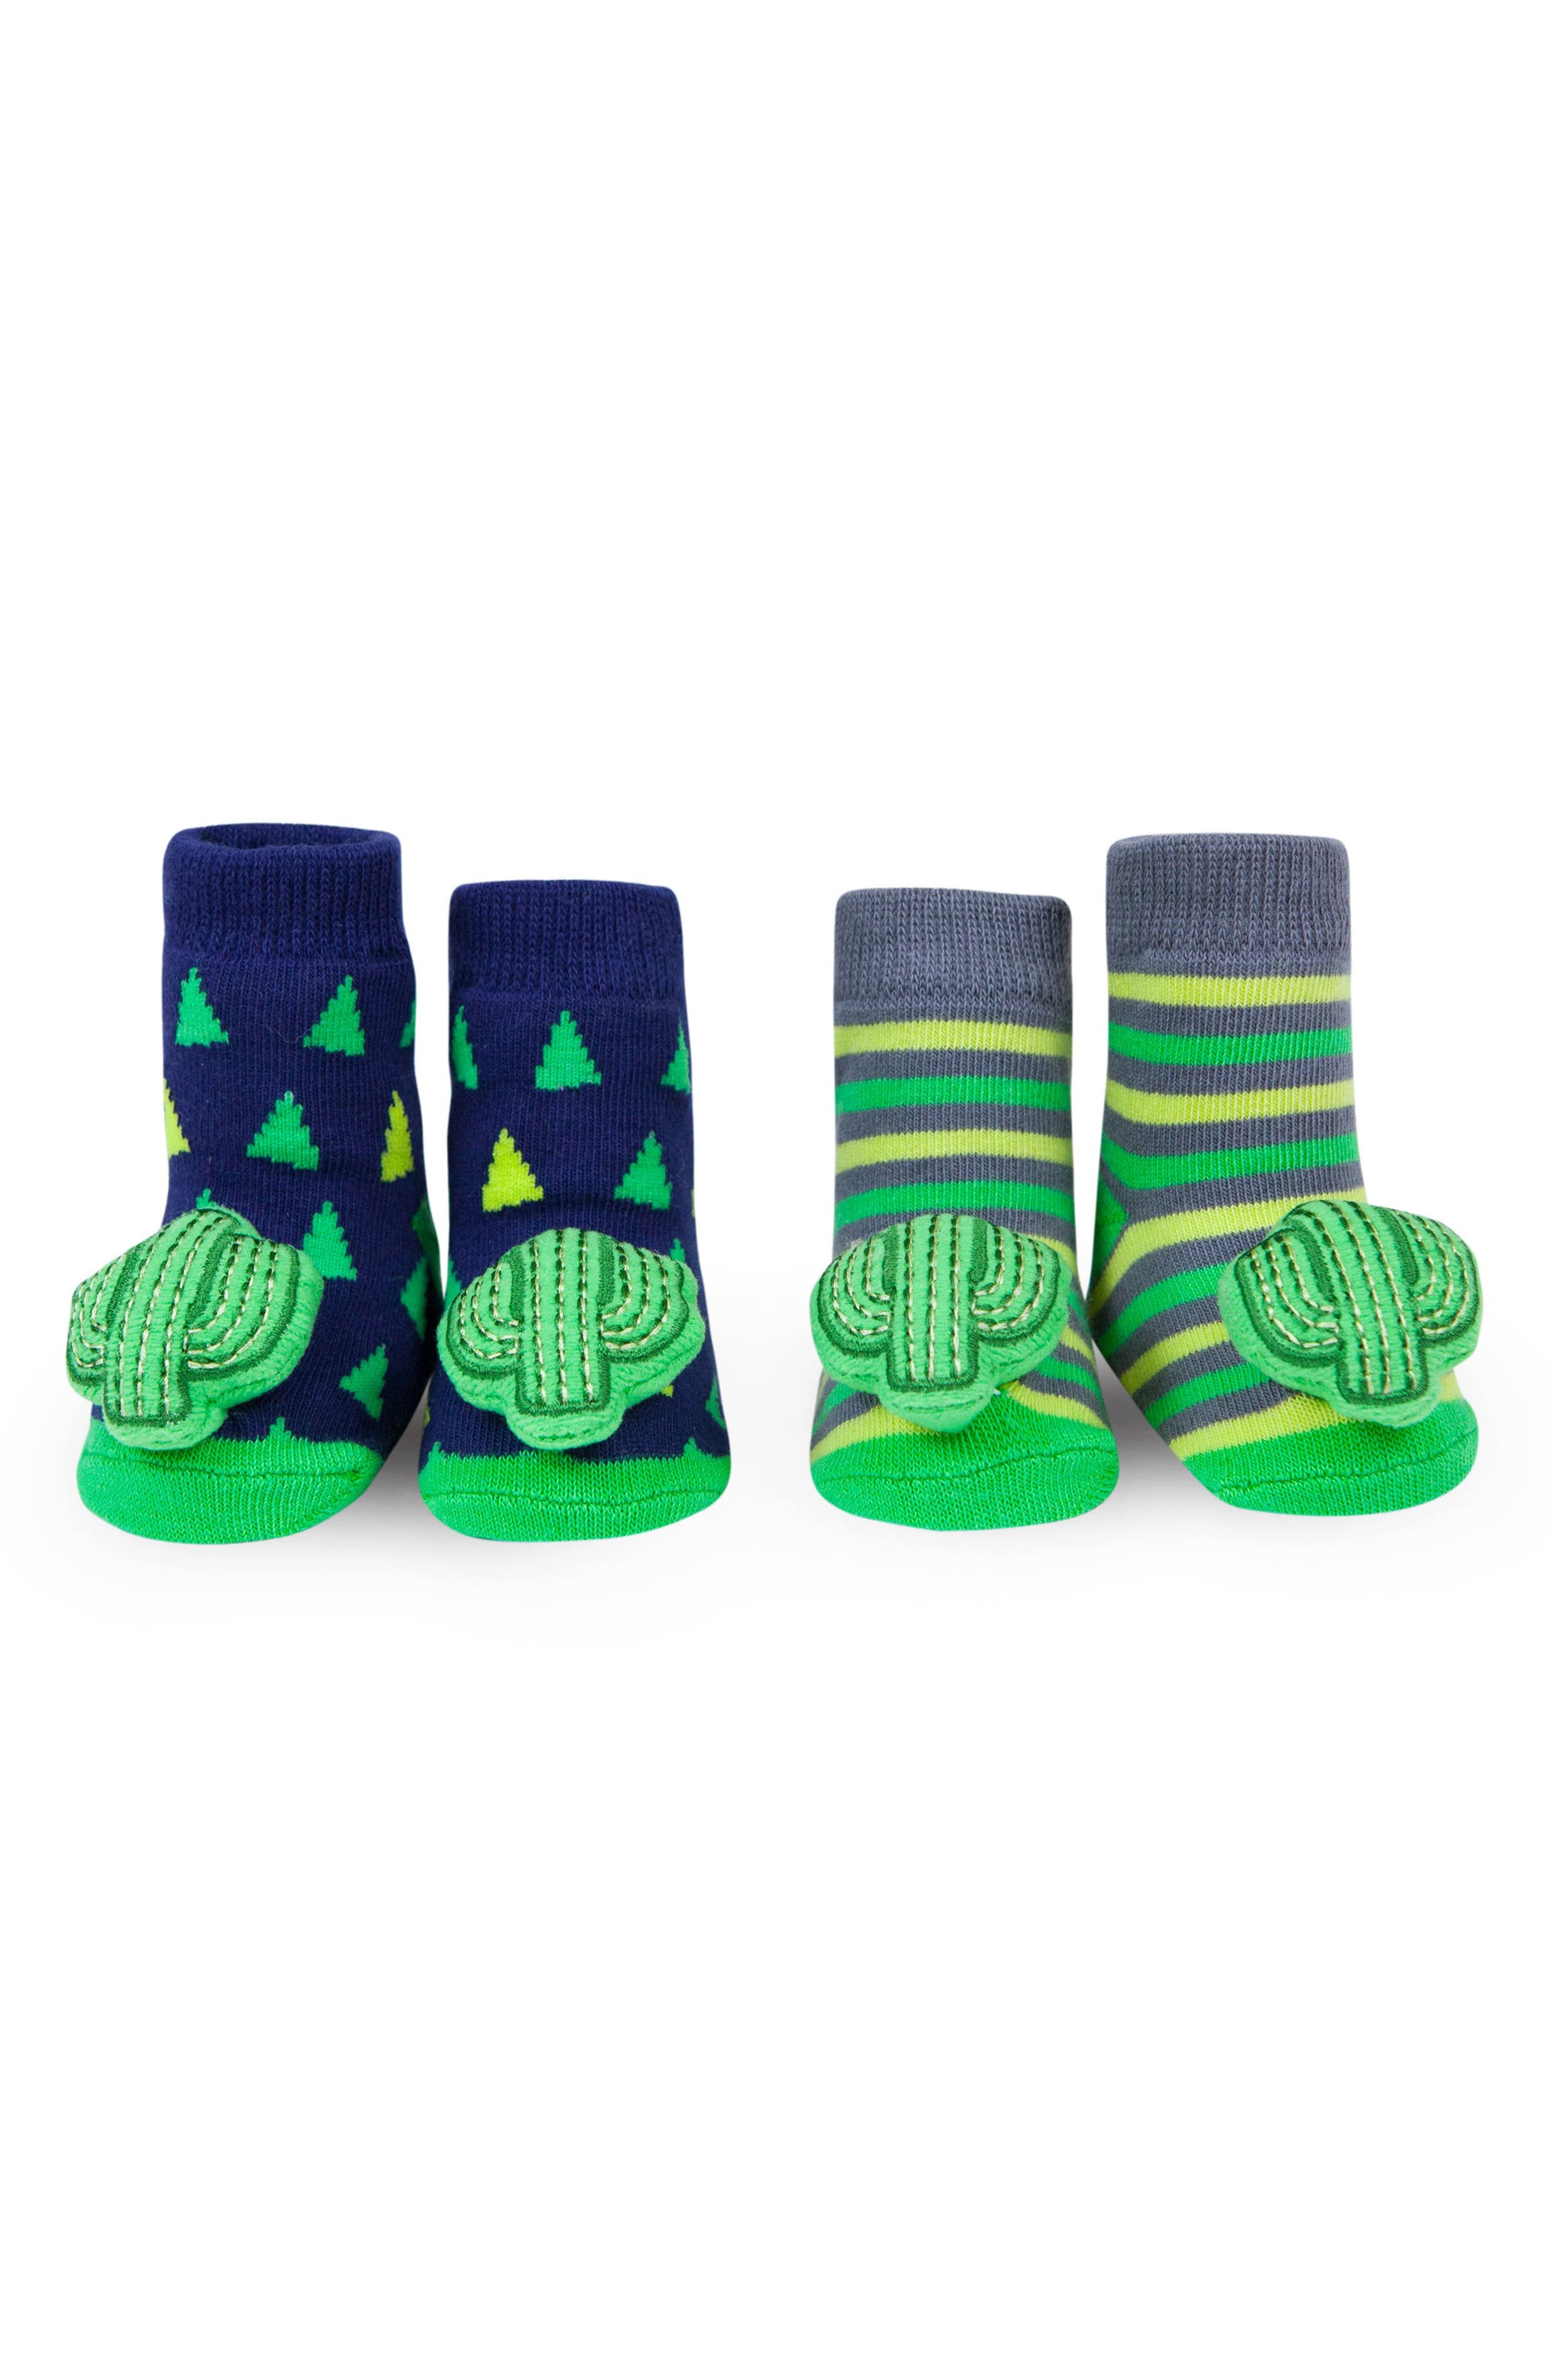 Cactus 2-Pack Rattle Socks,                         Main,                         color, 440